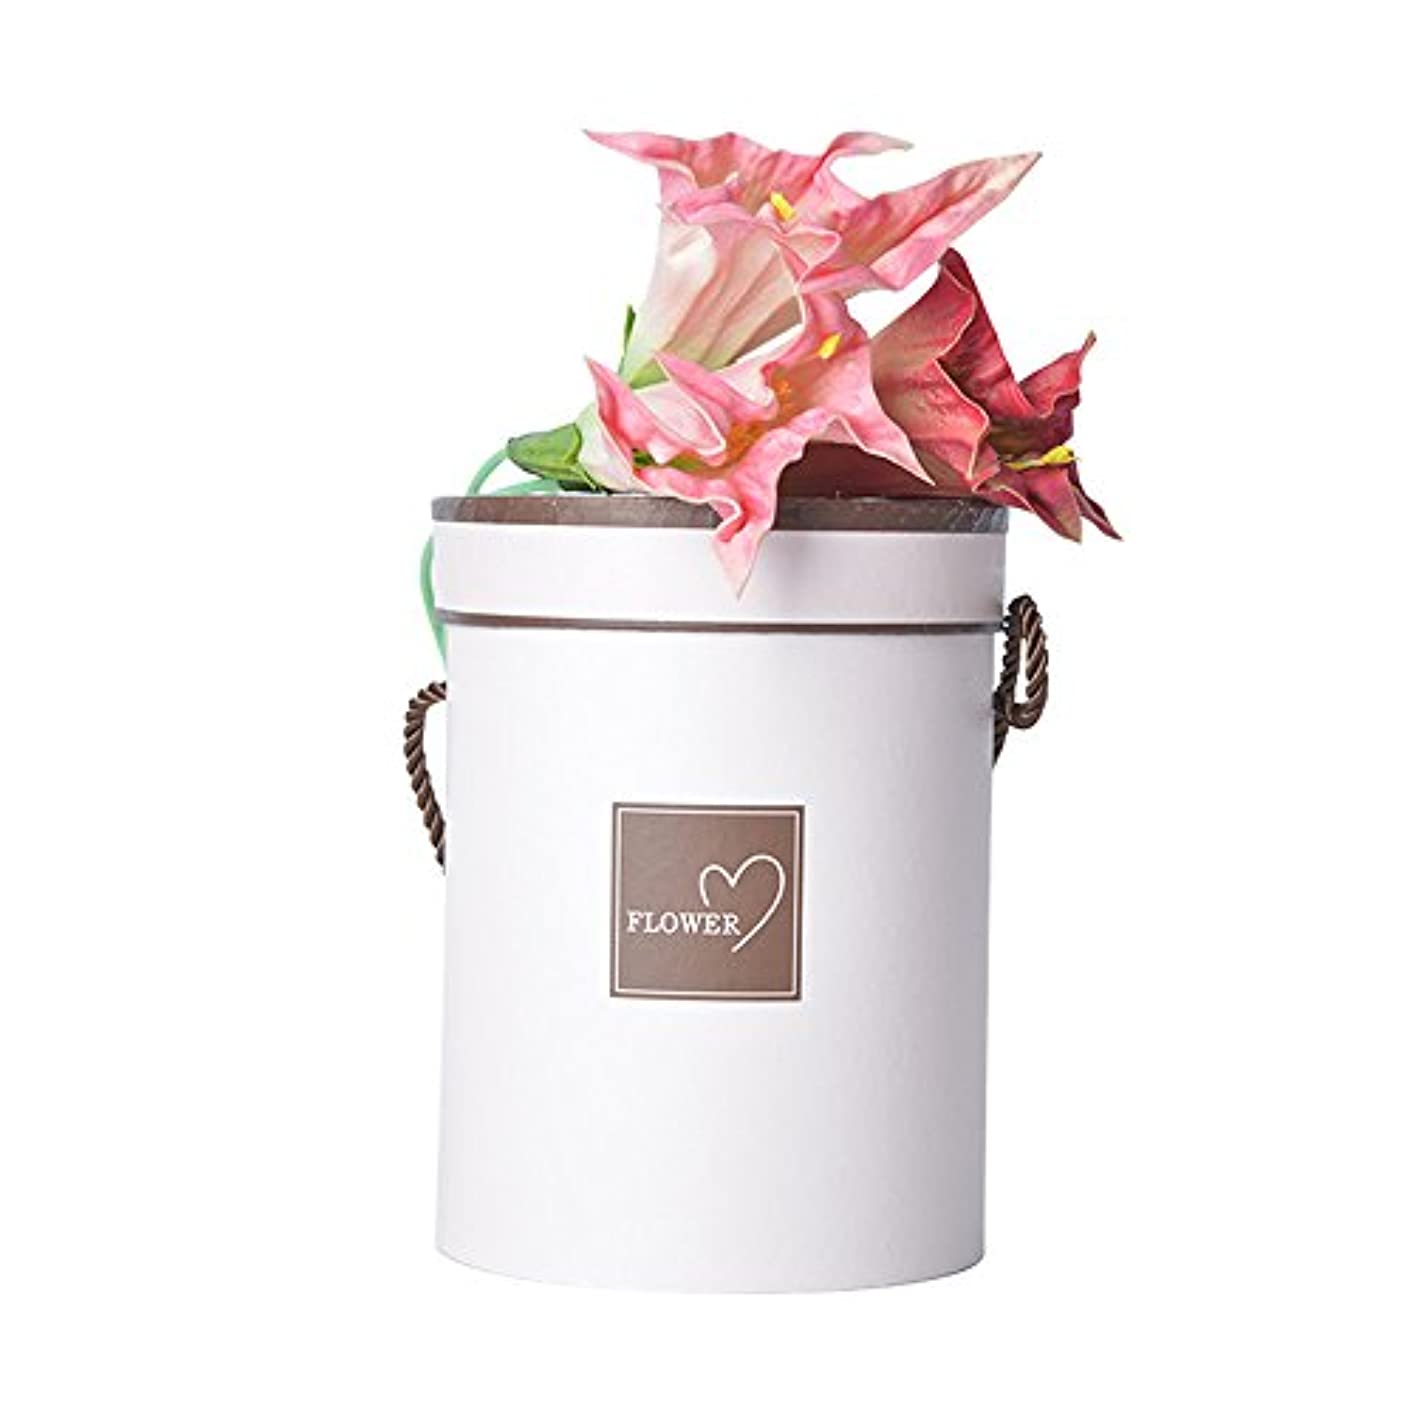 Gift Packaging Paper Box Decorating Round White Florist Box 1 Pcs